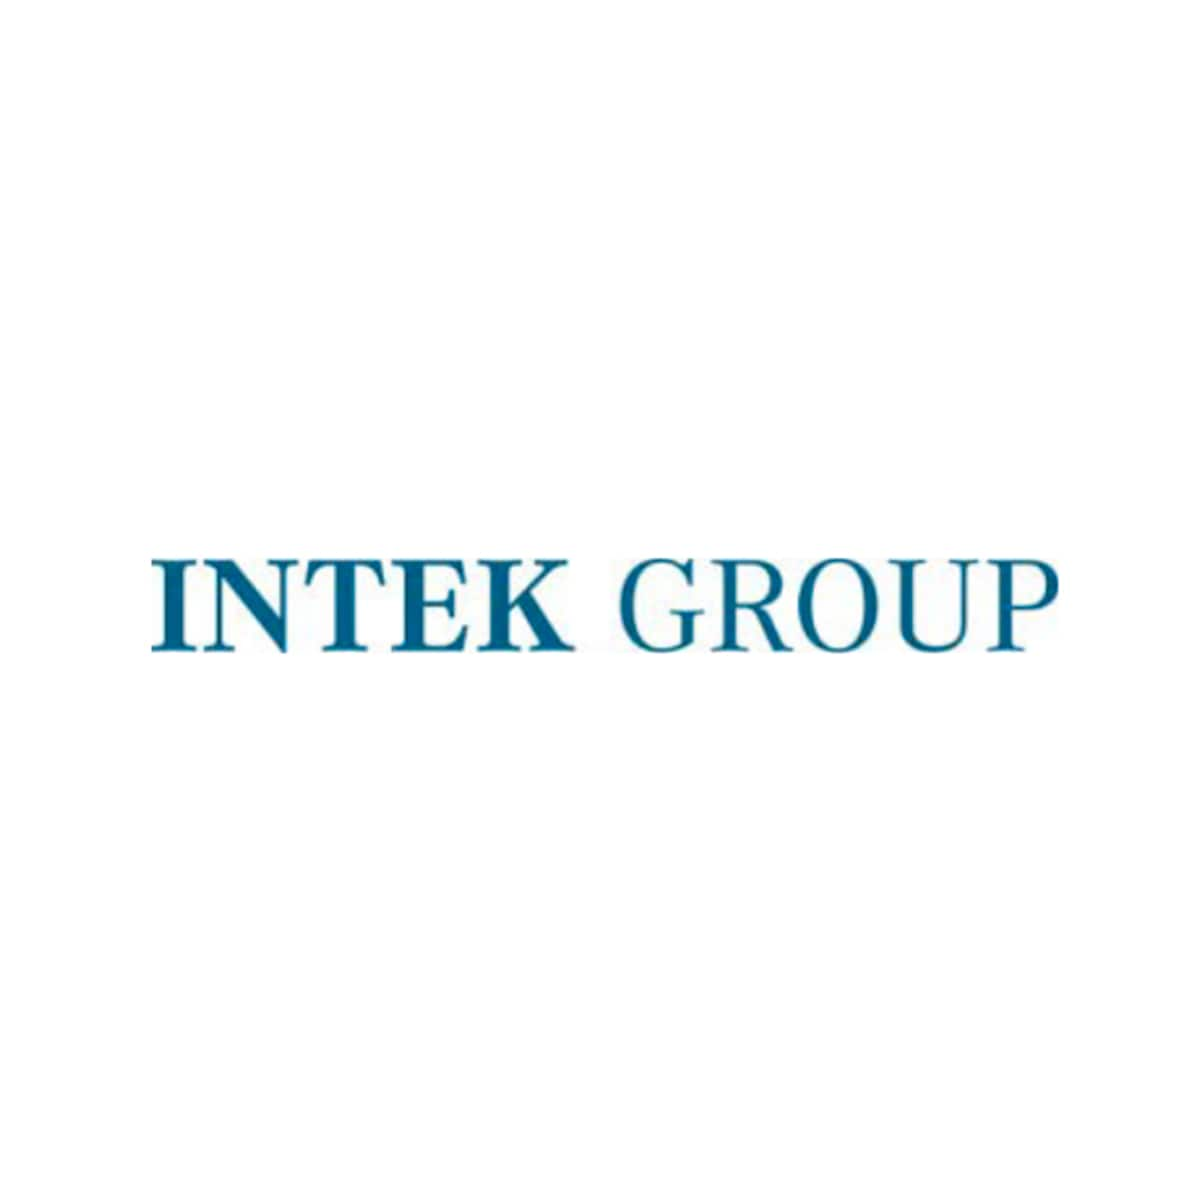 Intek Group, KME Italy finalizza l'aumento di capitale per Eredi Gnutti Metalli